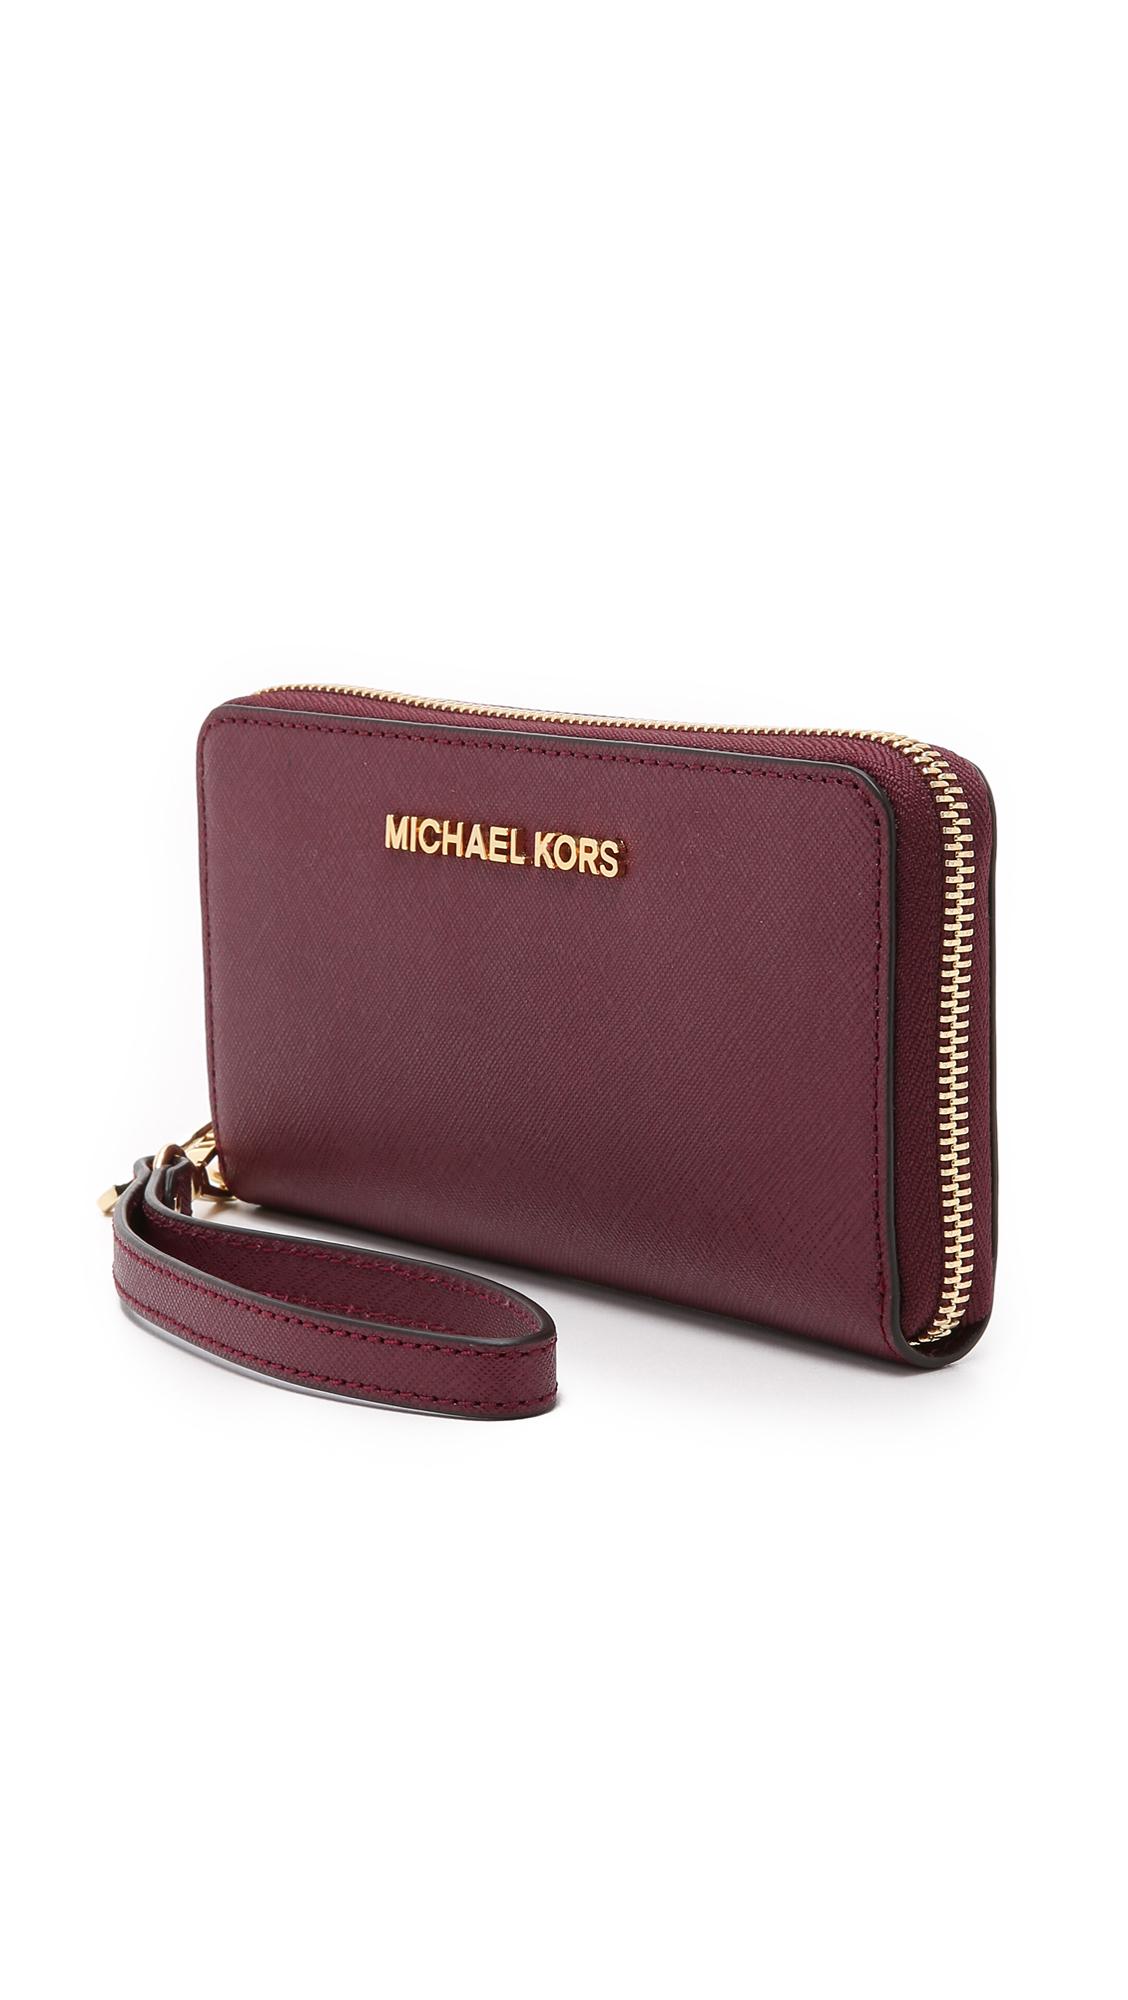 ea1e7f9ed18f Michael Kors Wallet Phone Case - Best Photo Wallet Justiceforkenny.Org